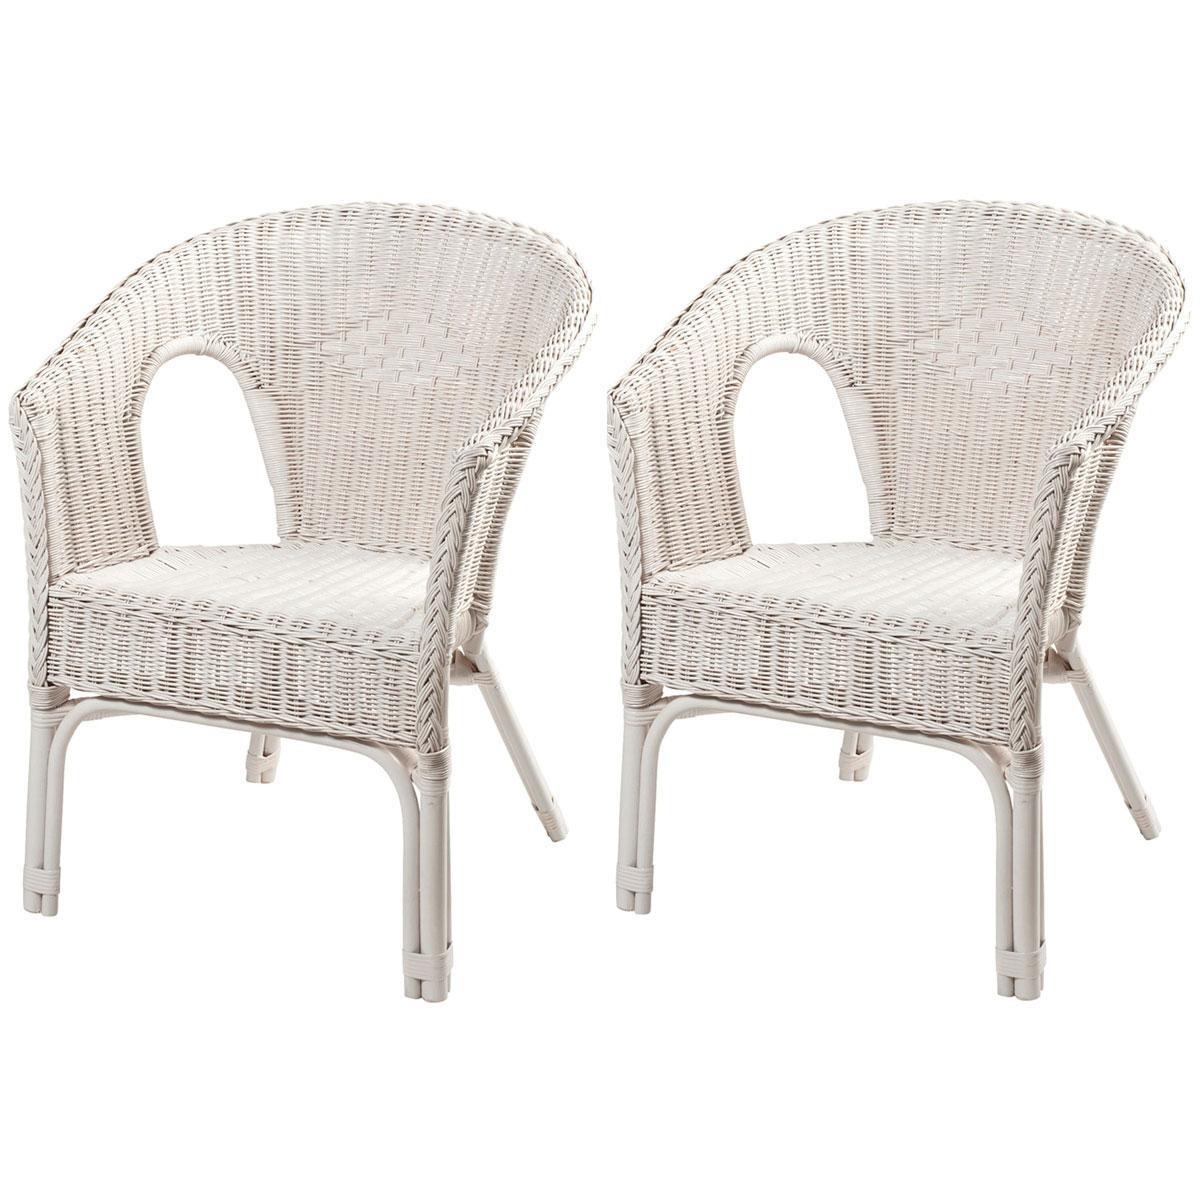 fauteuil rotin conforama meilleur maison du monde a osier fauteuil rotin conforama inspirant pas cher wiblia photos of